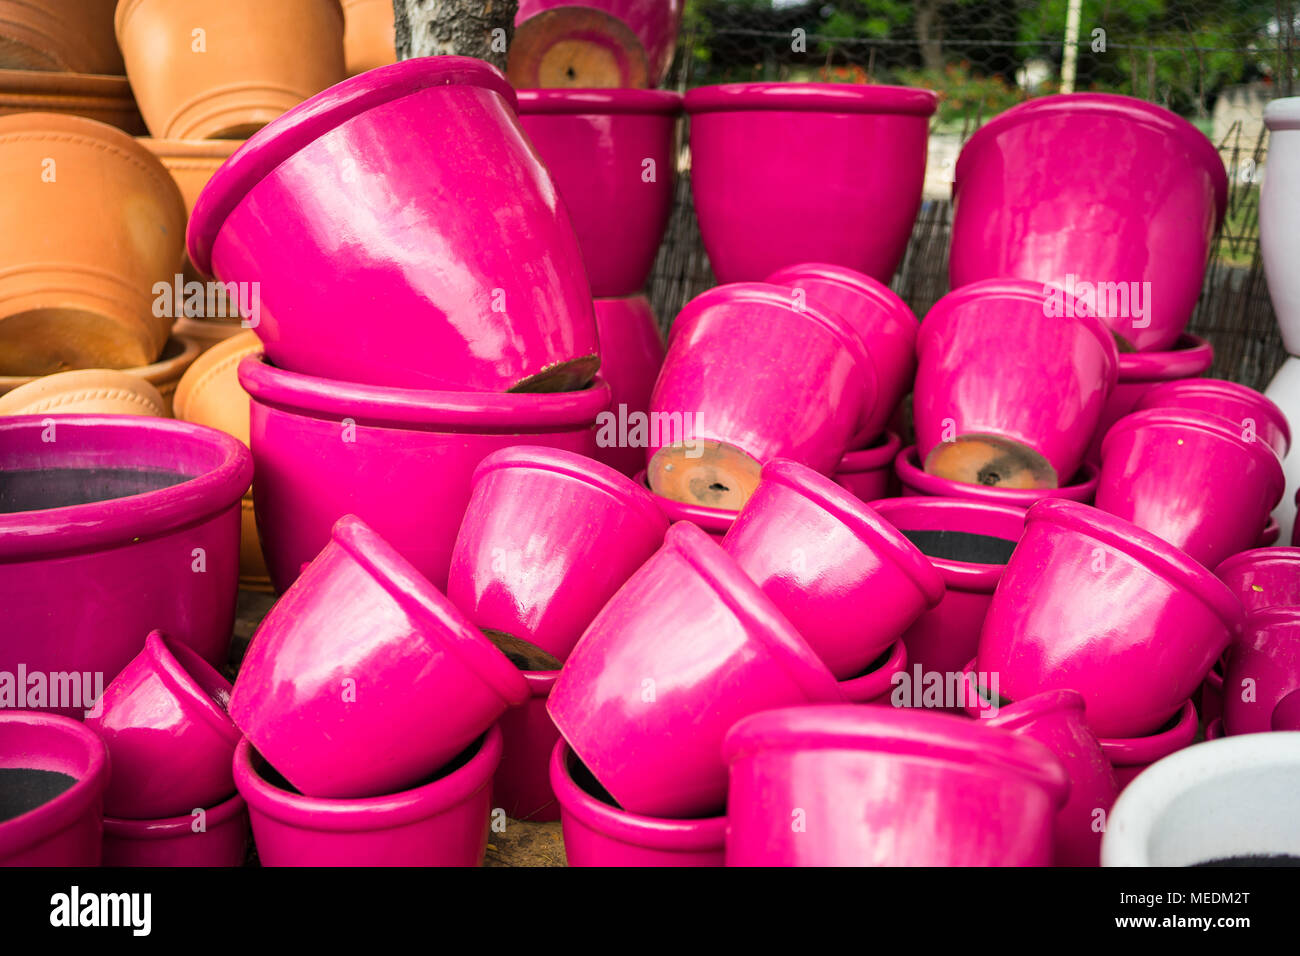 Large Ceramic Flower Pots Stock Photos Large Ceramic Flower Pots